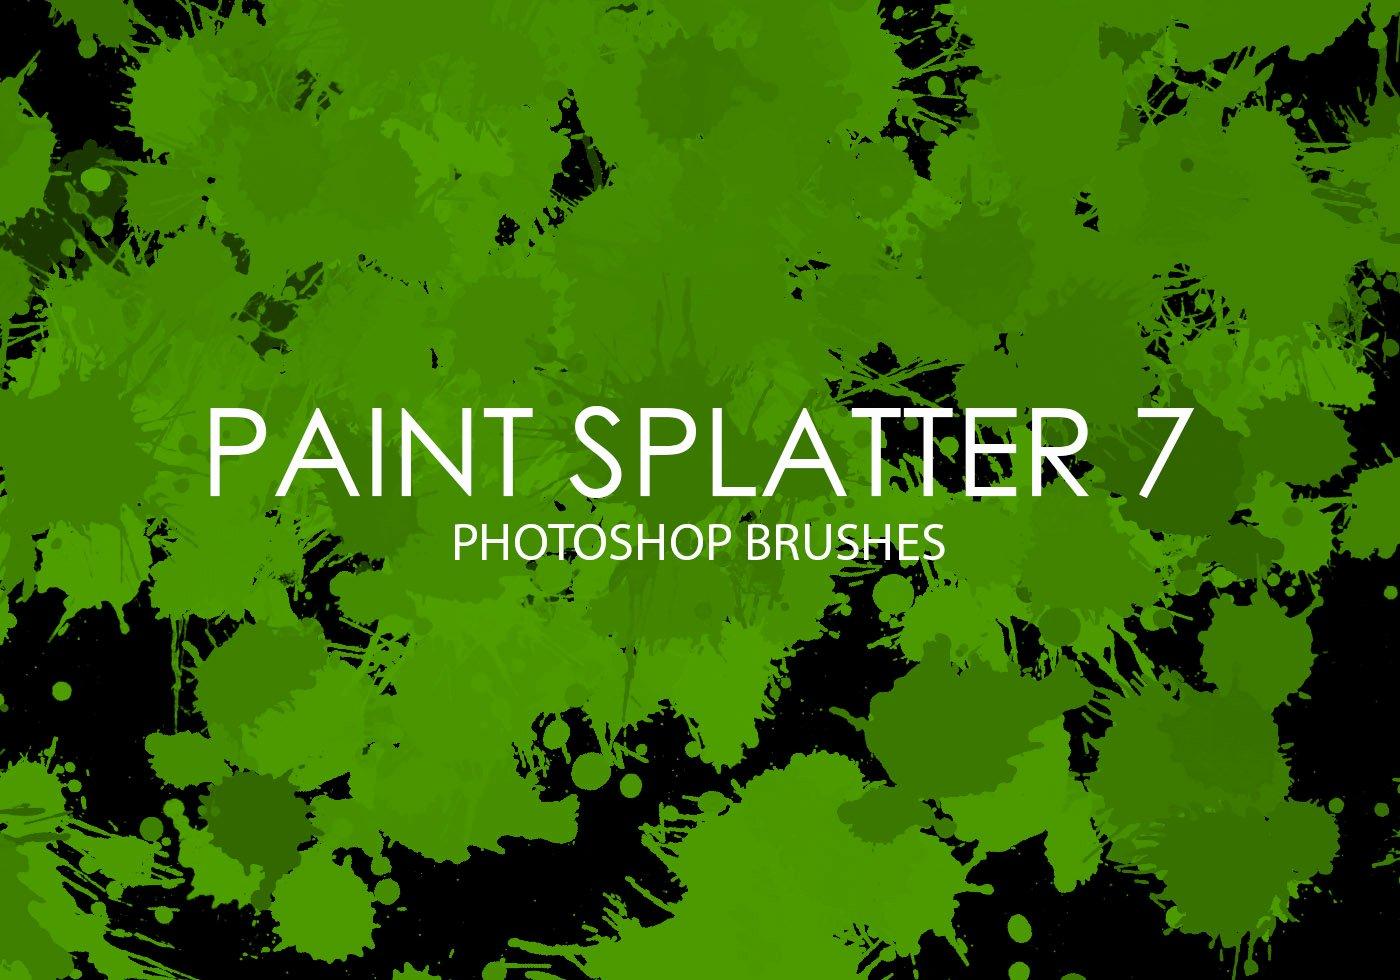 Paint Splatter Brush Photoshop Elegant Free Paint Splatter Shop Brushes 7 Free Shop